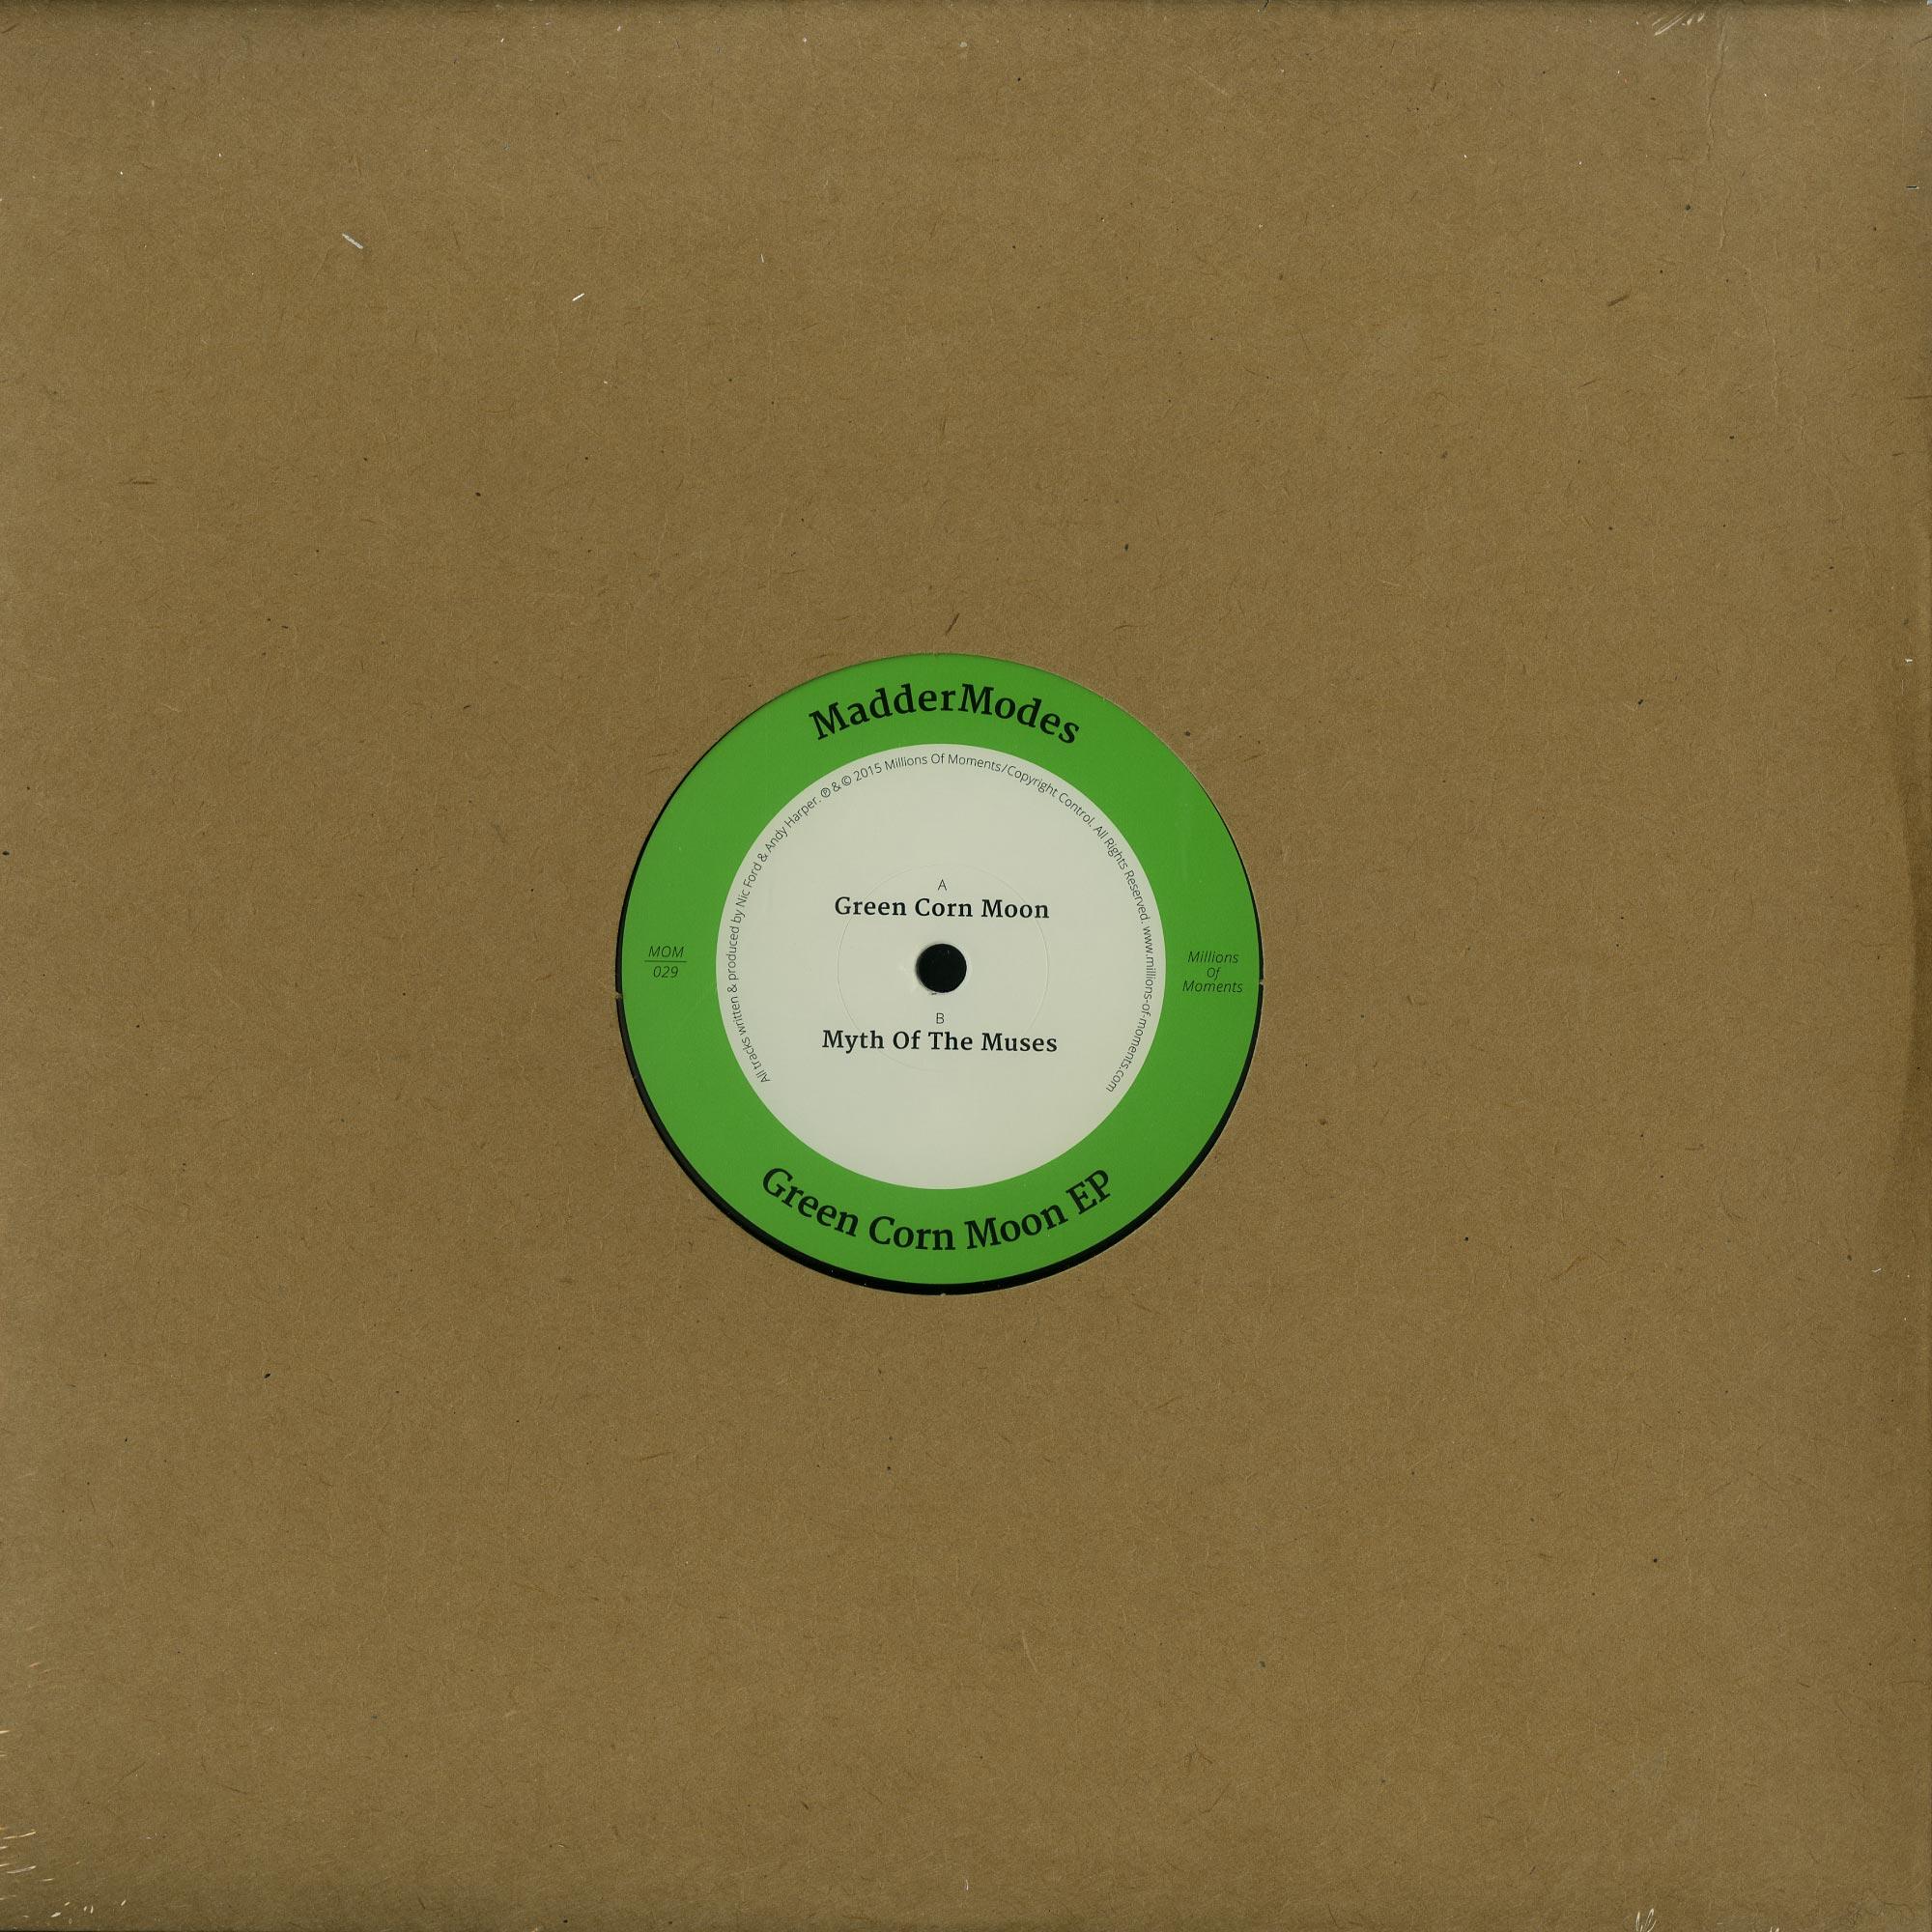 MadderModes - GREEN CORN MOON EP